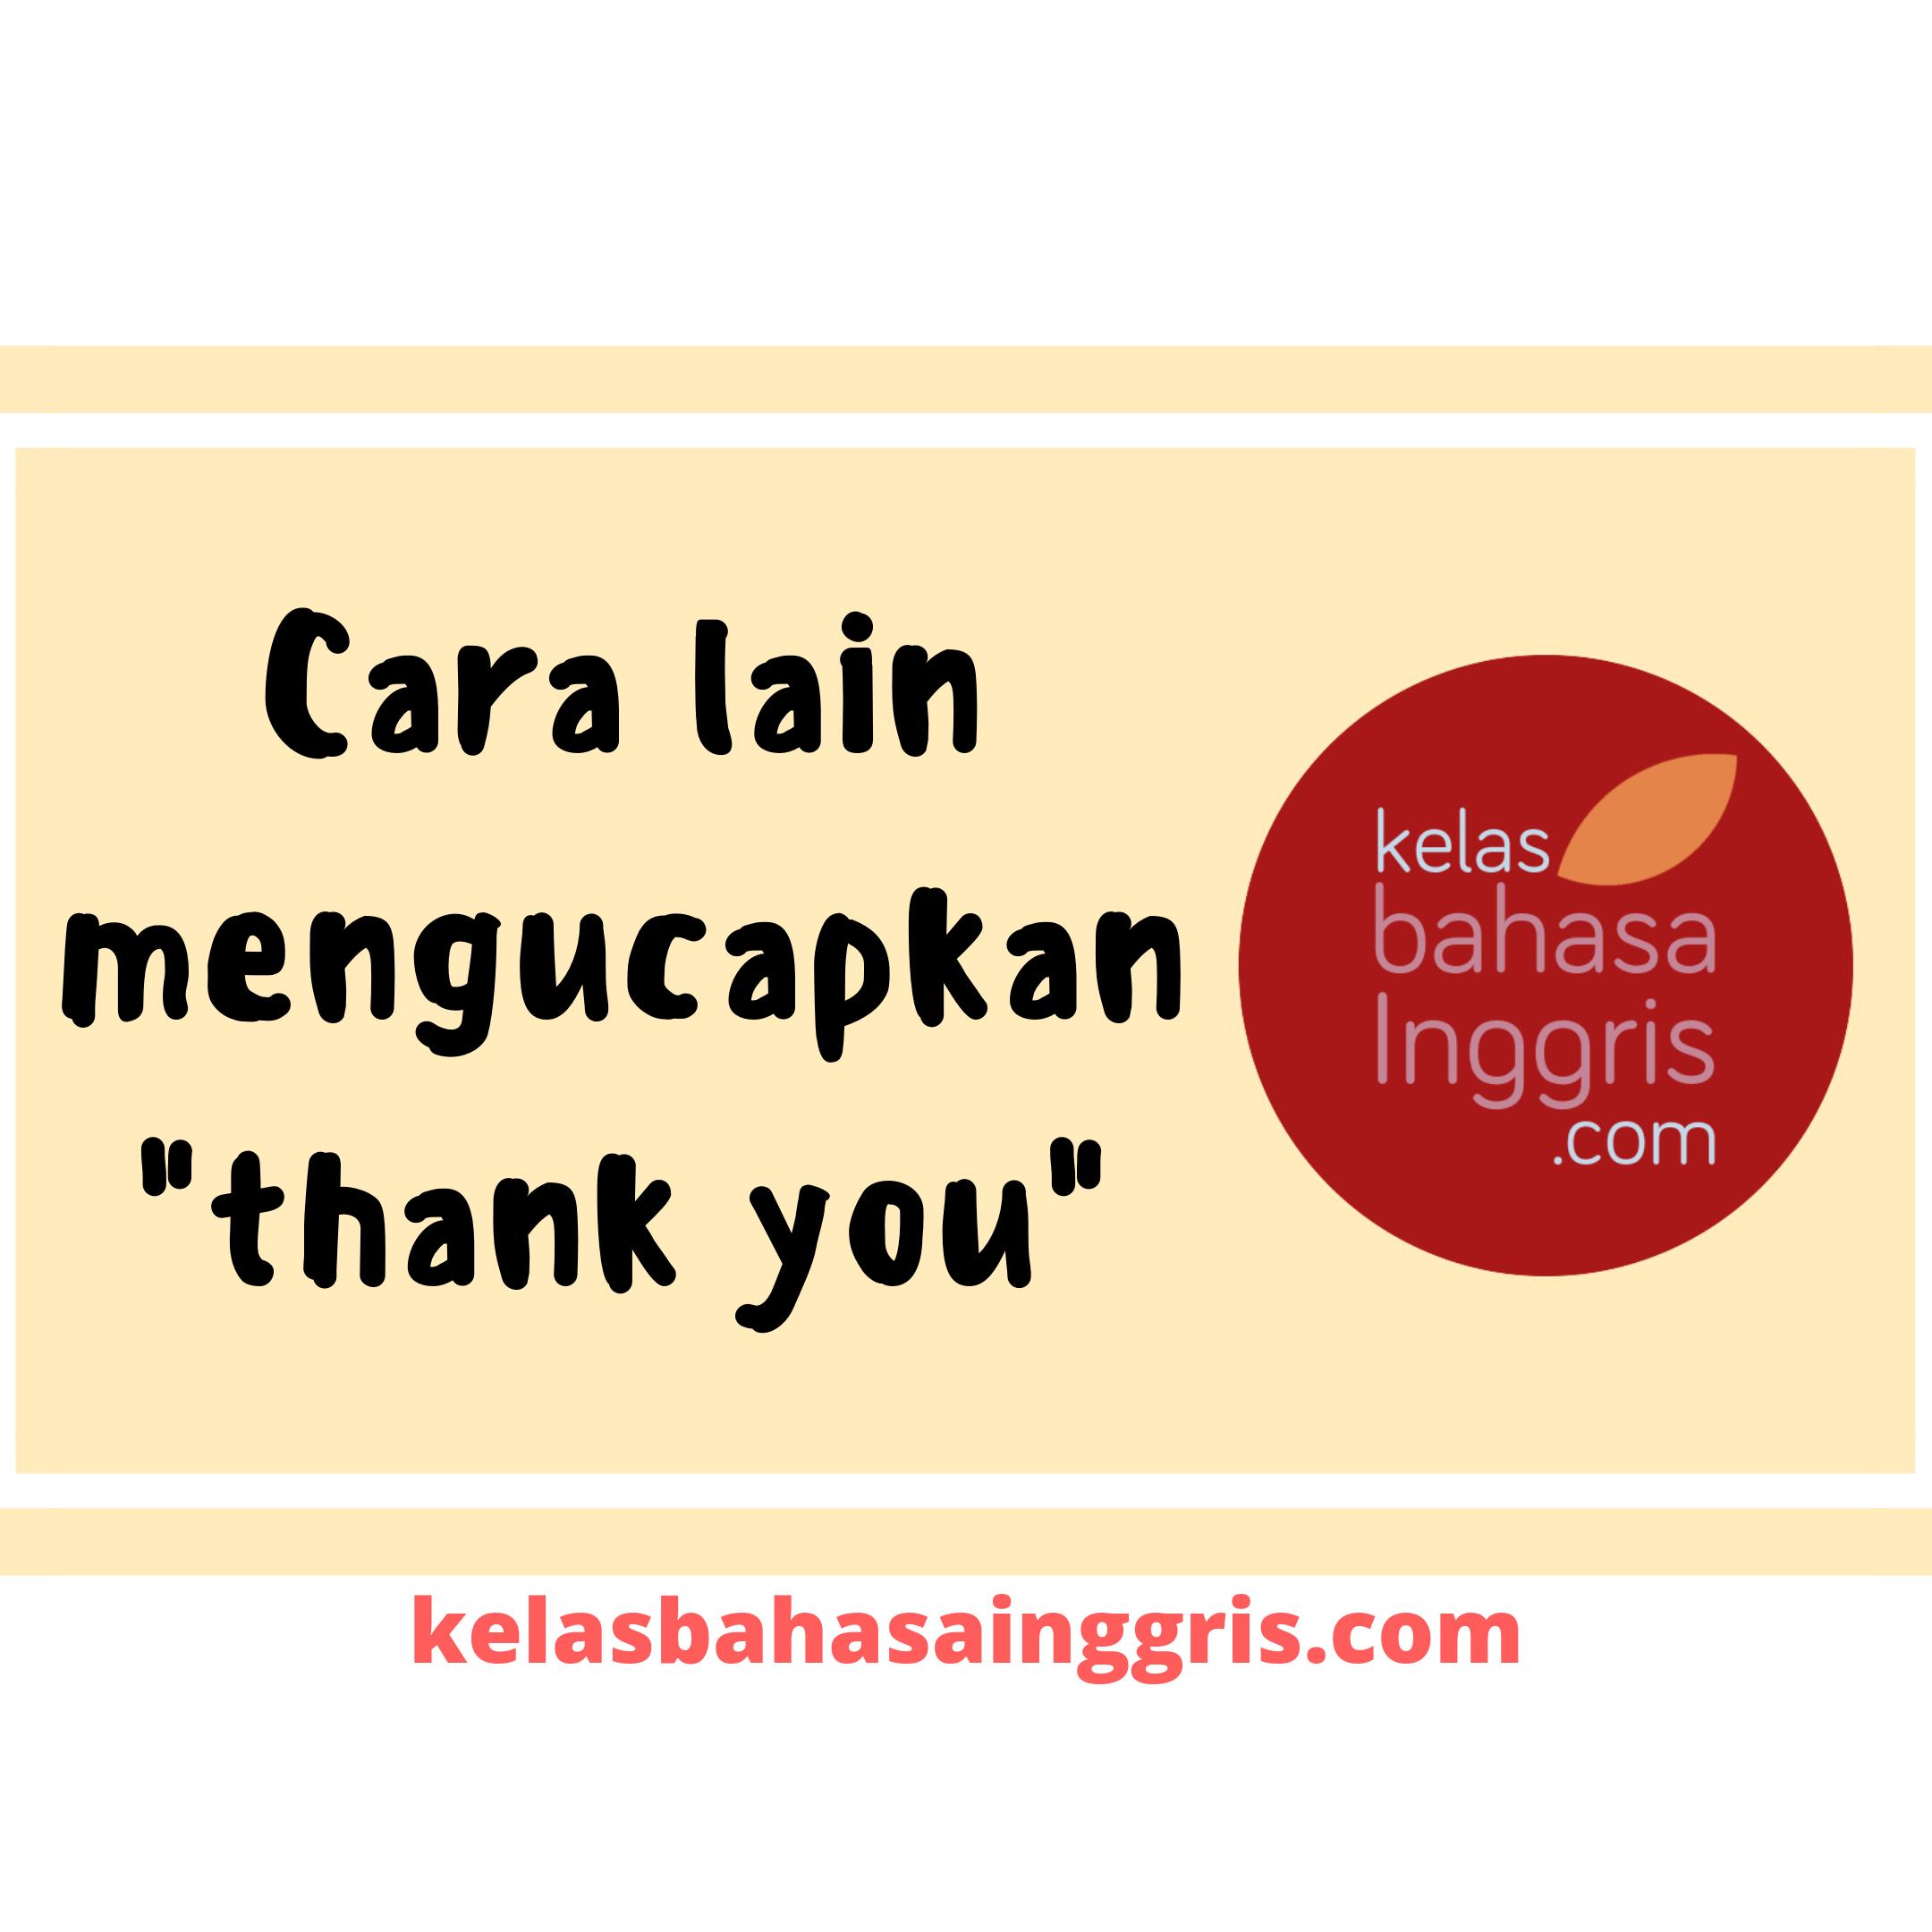 Cara lain mengucapkan thank you